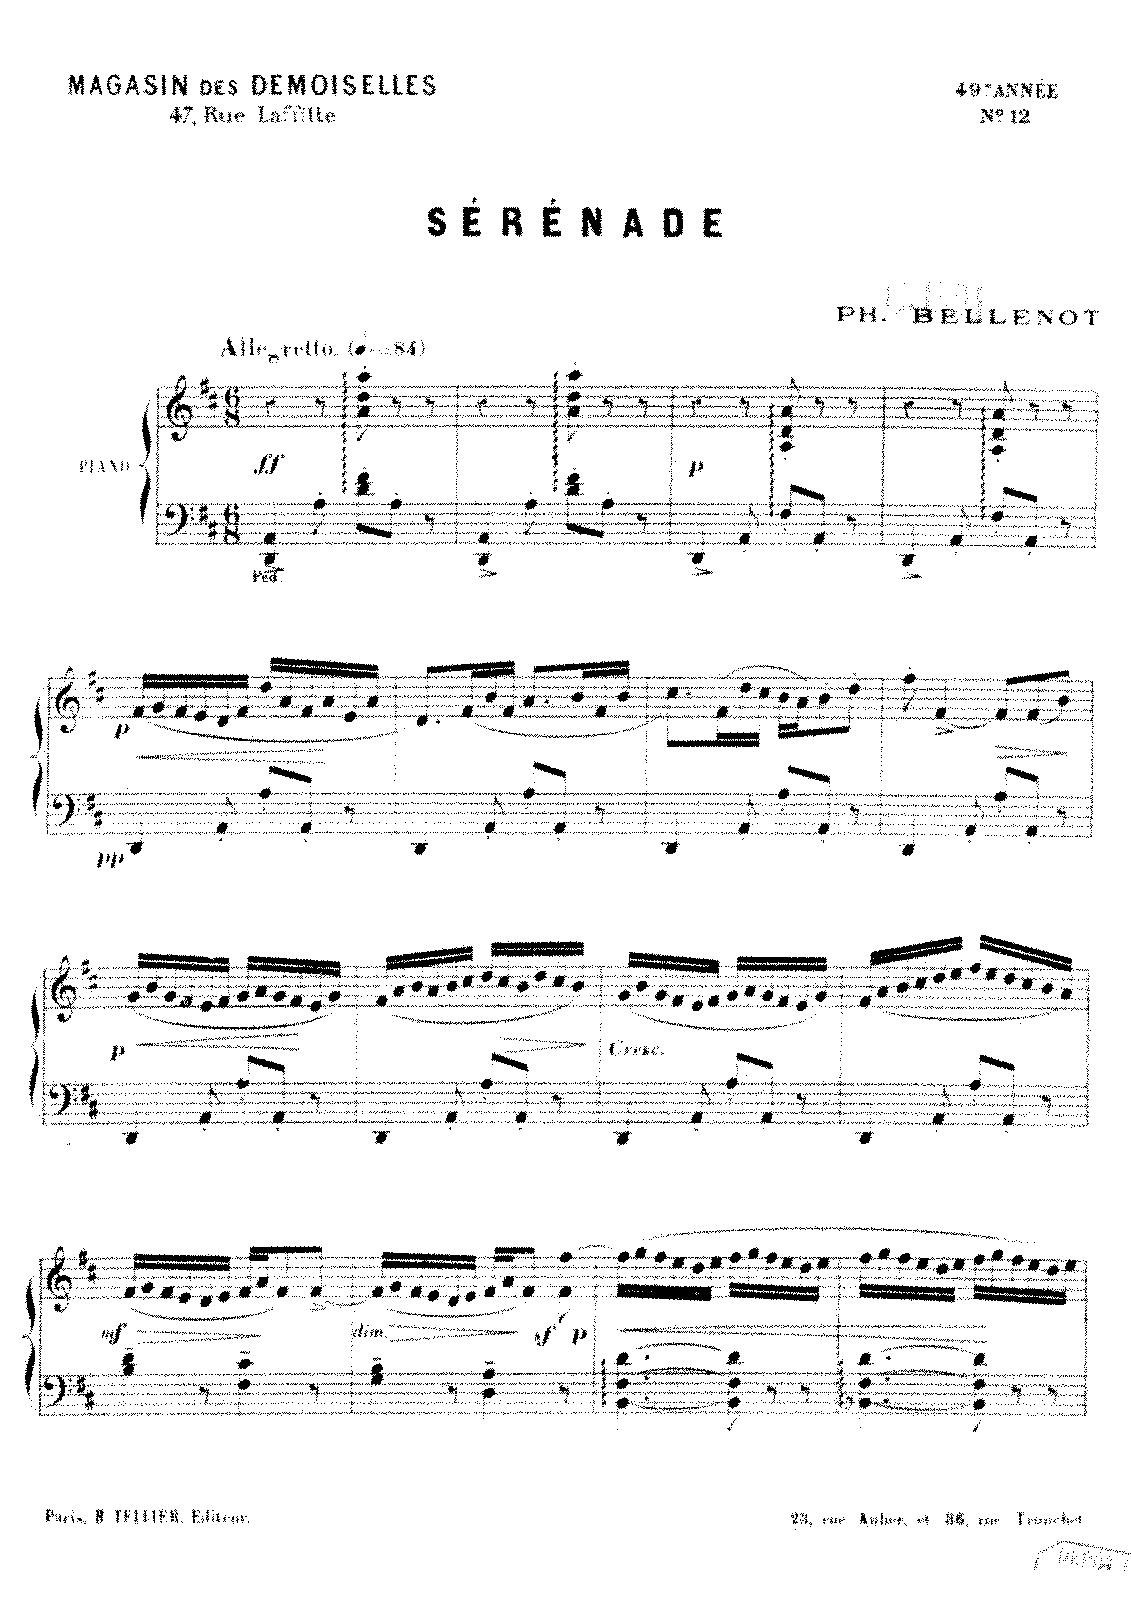 Sérénade (Bellenot, Philippe) - IMSLP/Petrucci Music Library: Free